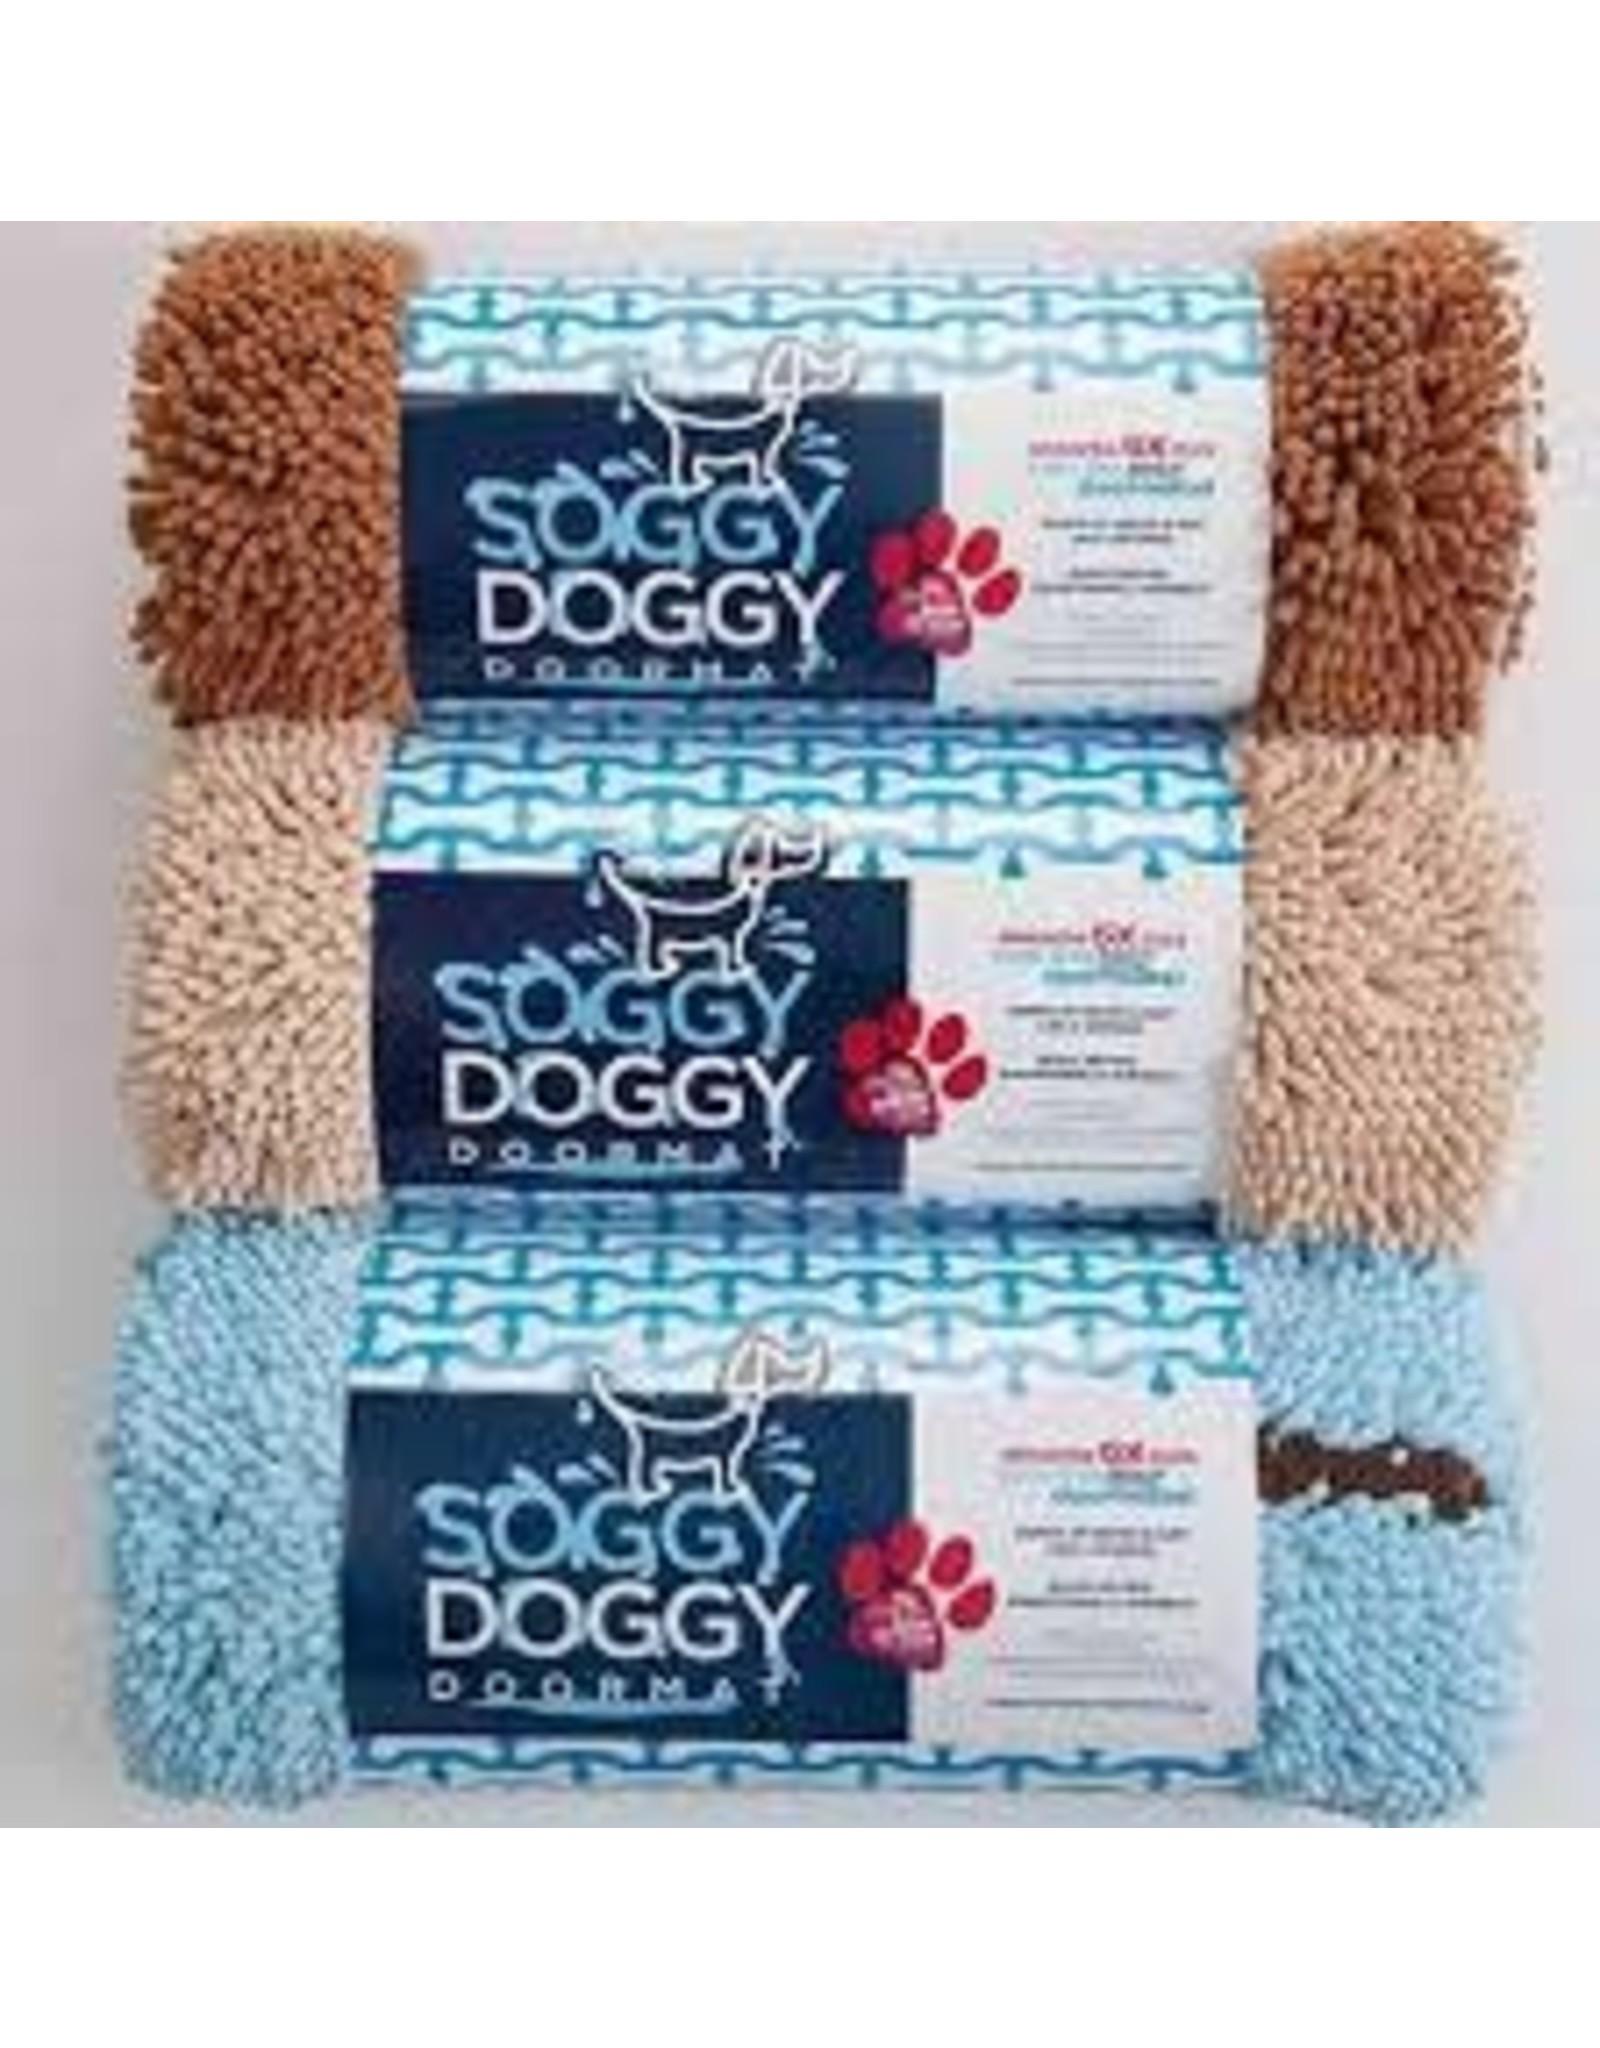 SOGGY DOGGY SOGGY DOGGY DOORMAT LIGHT BLUE 26X36